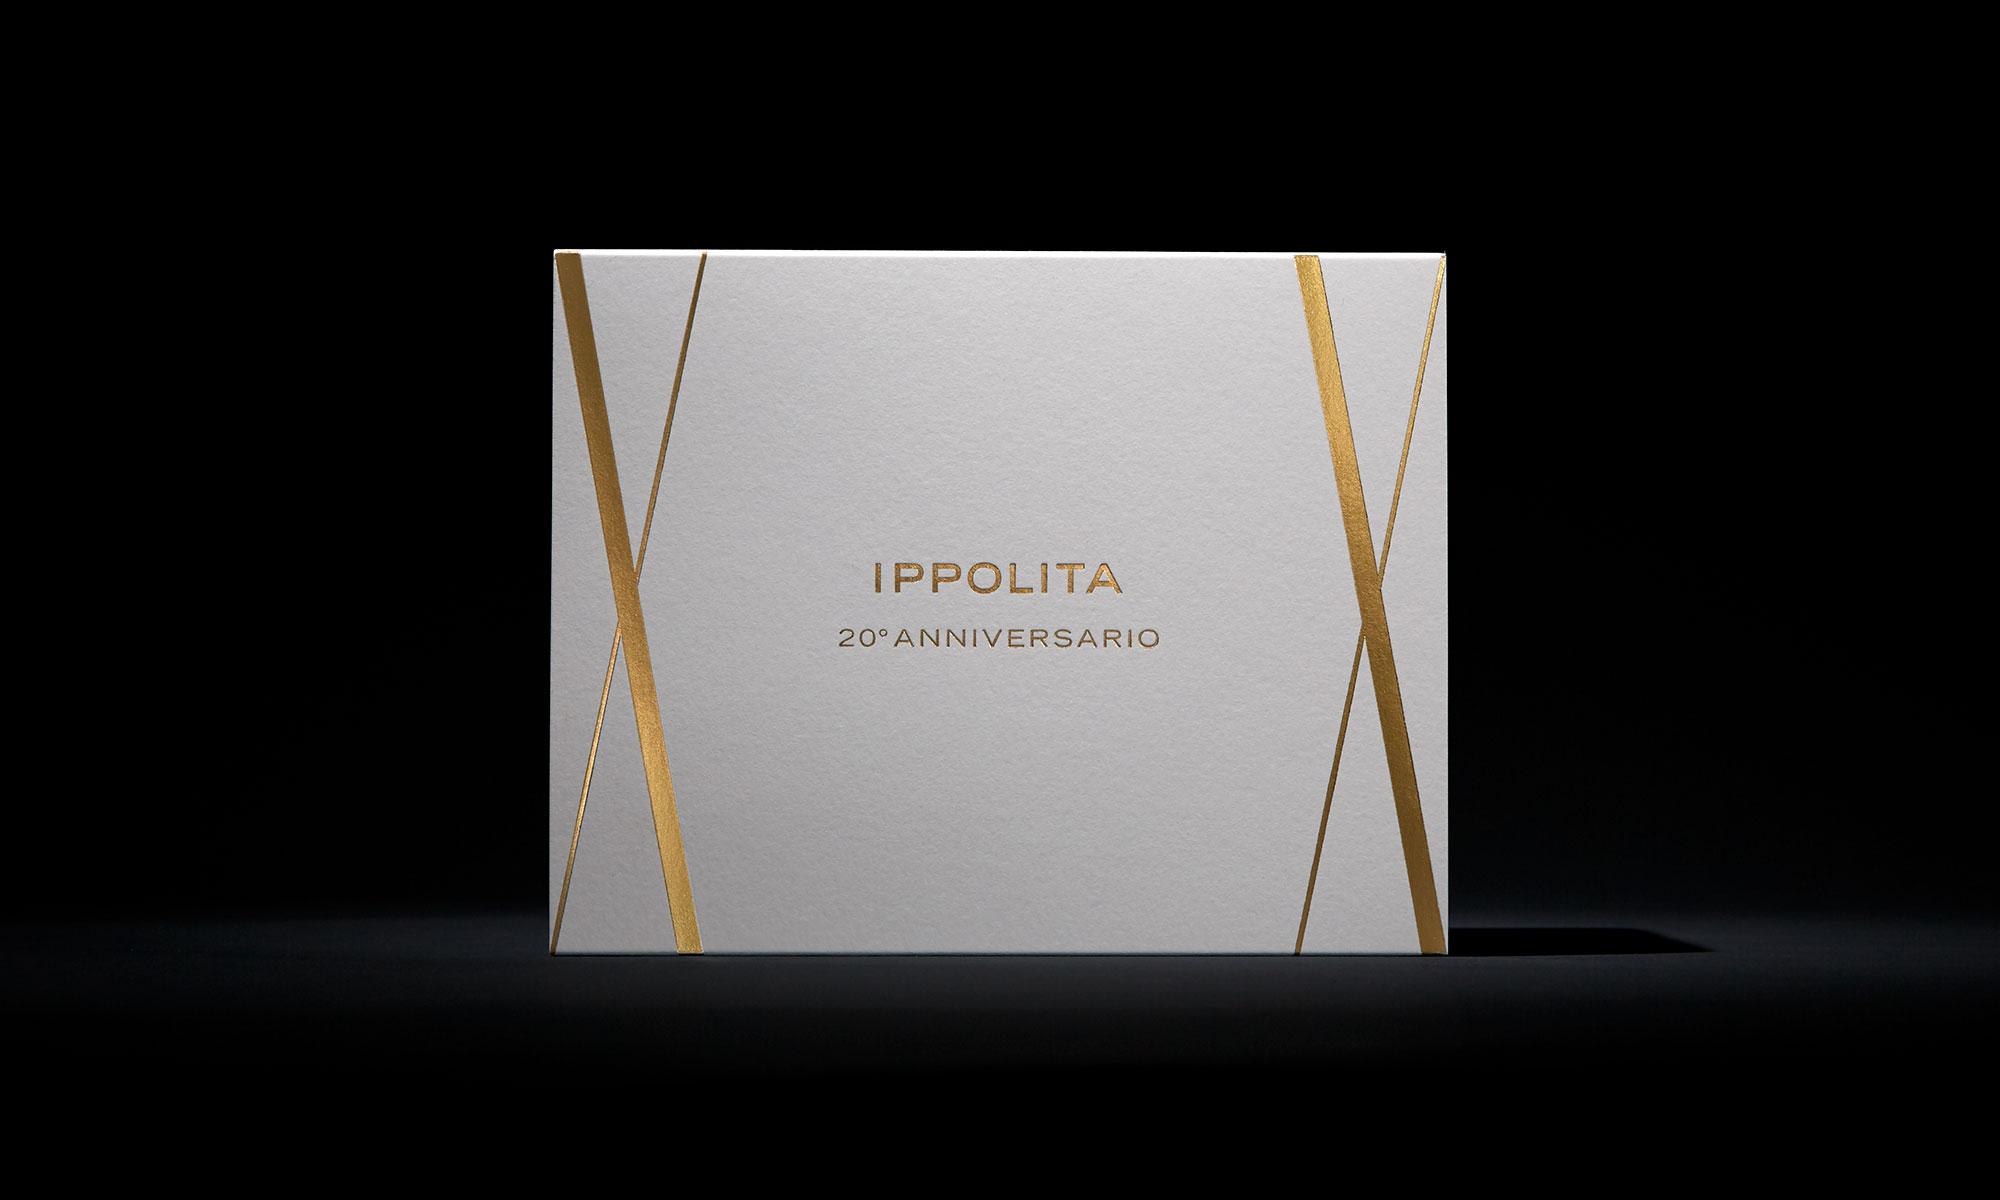 Ippolita box front